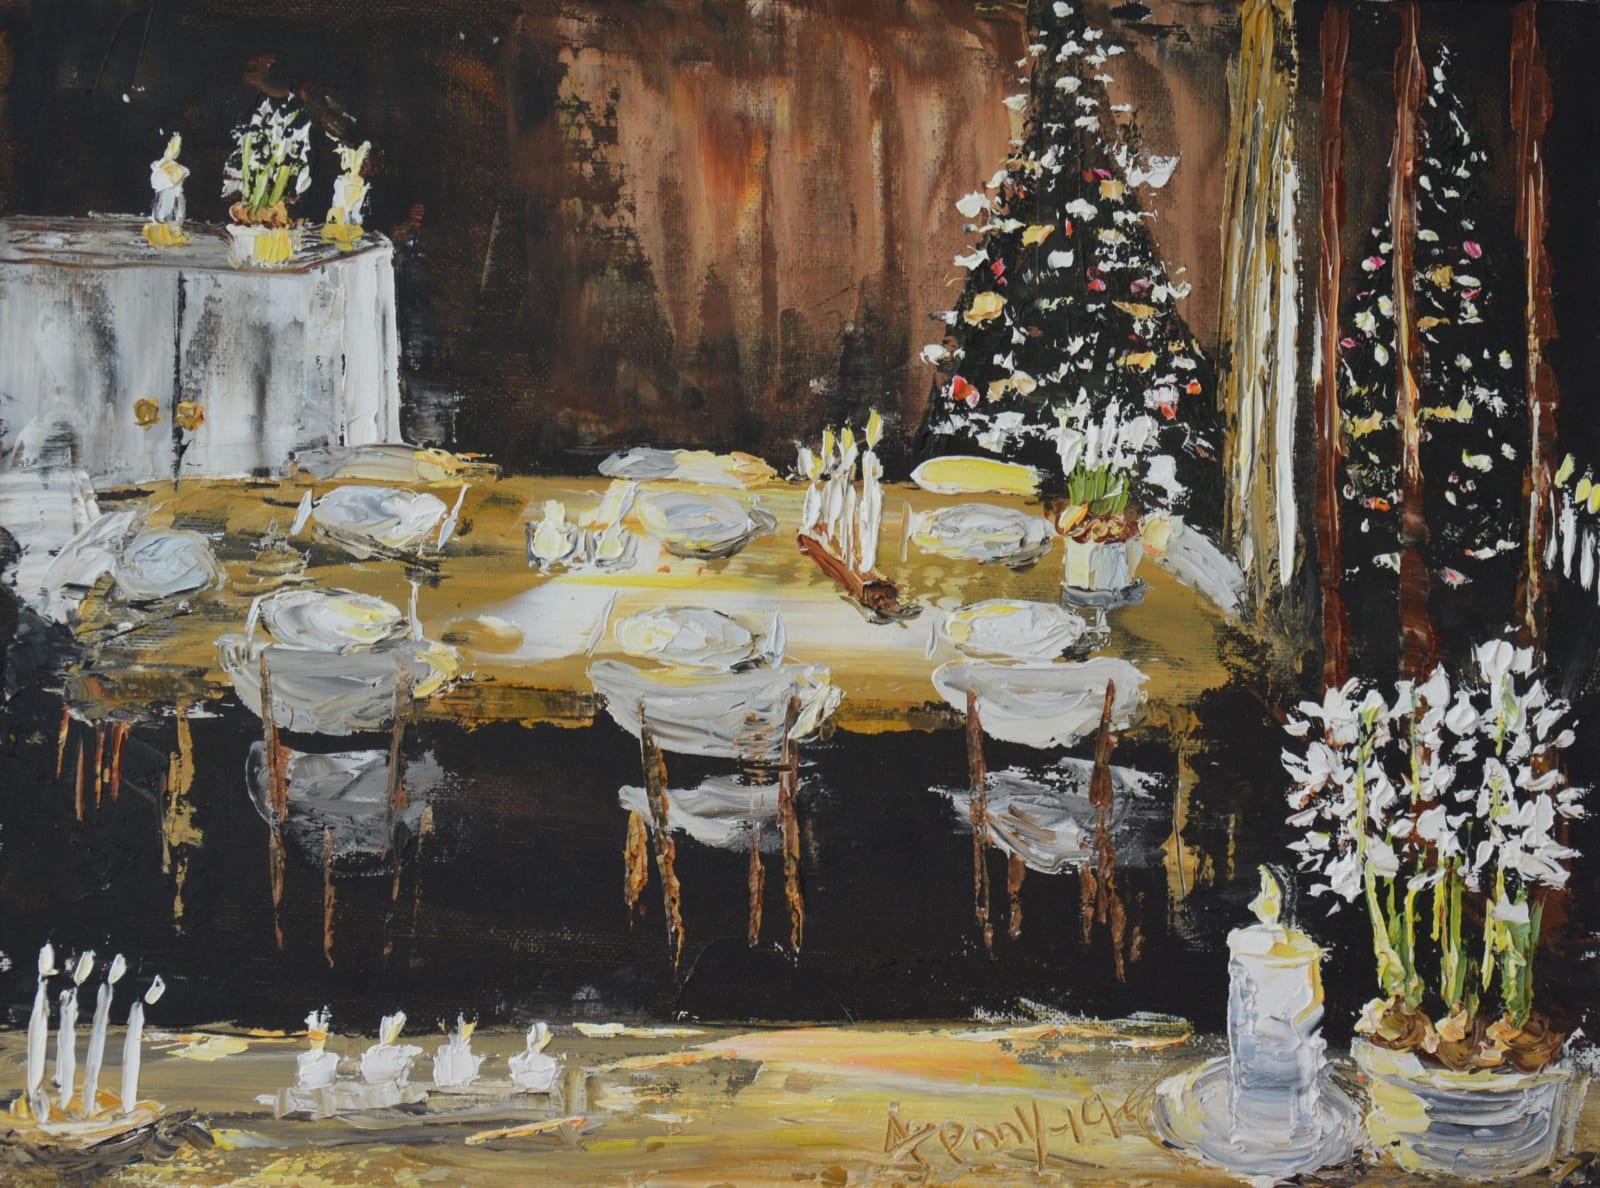 Jenny Wilson, Hyacinths Candles & Christmas